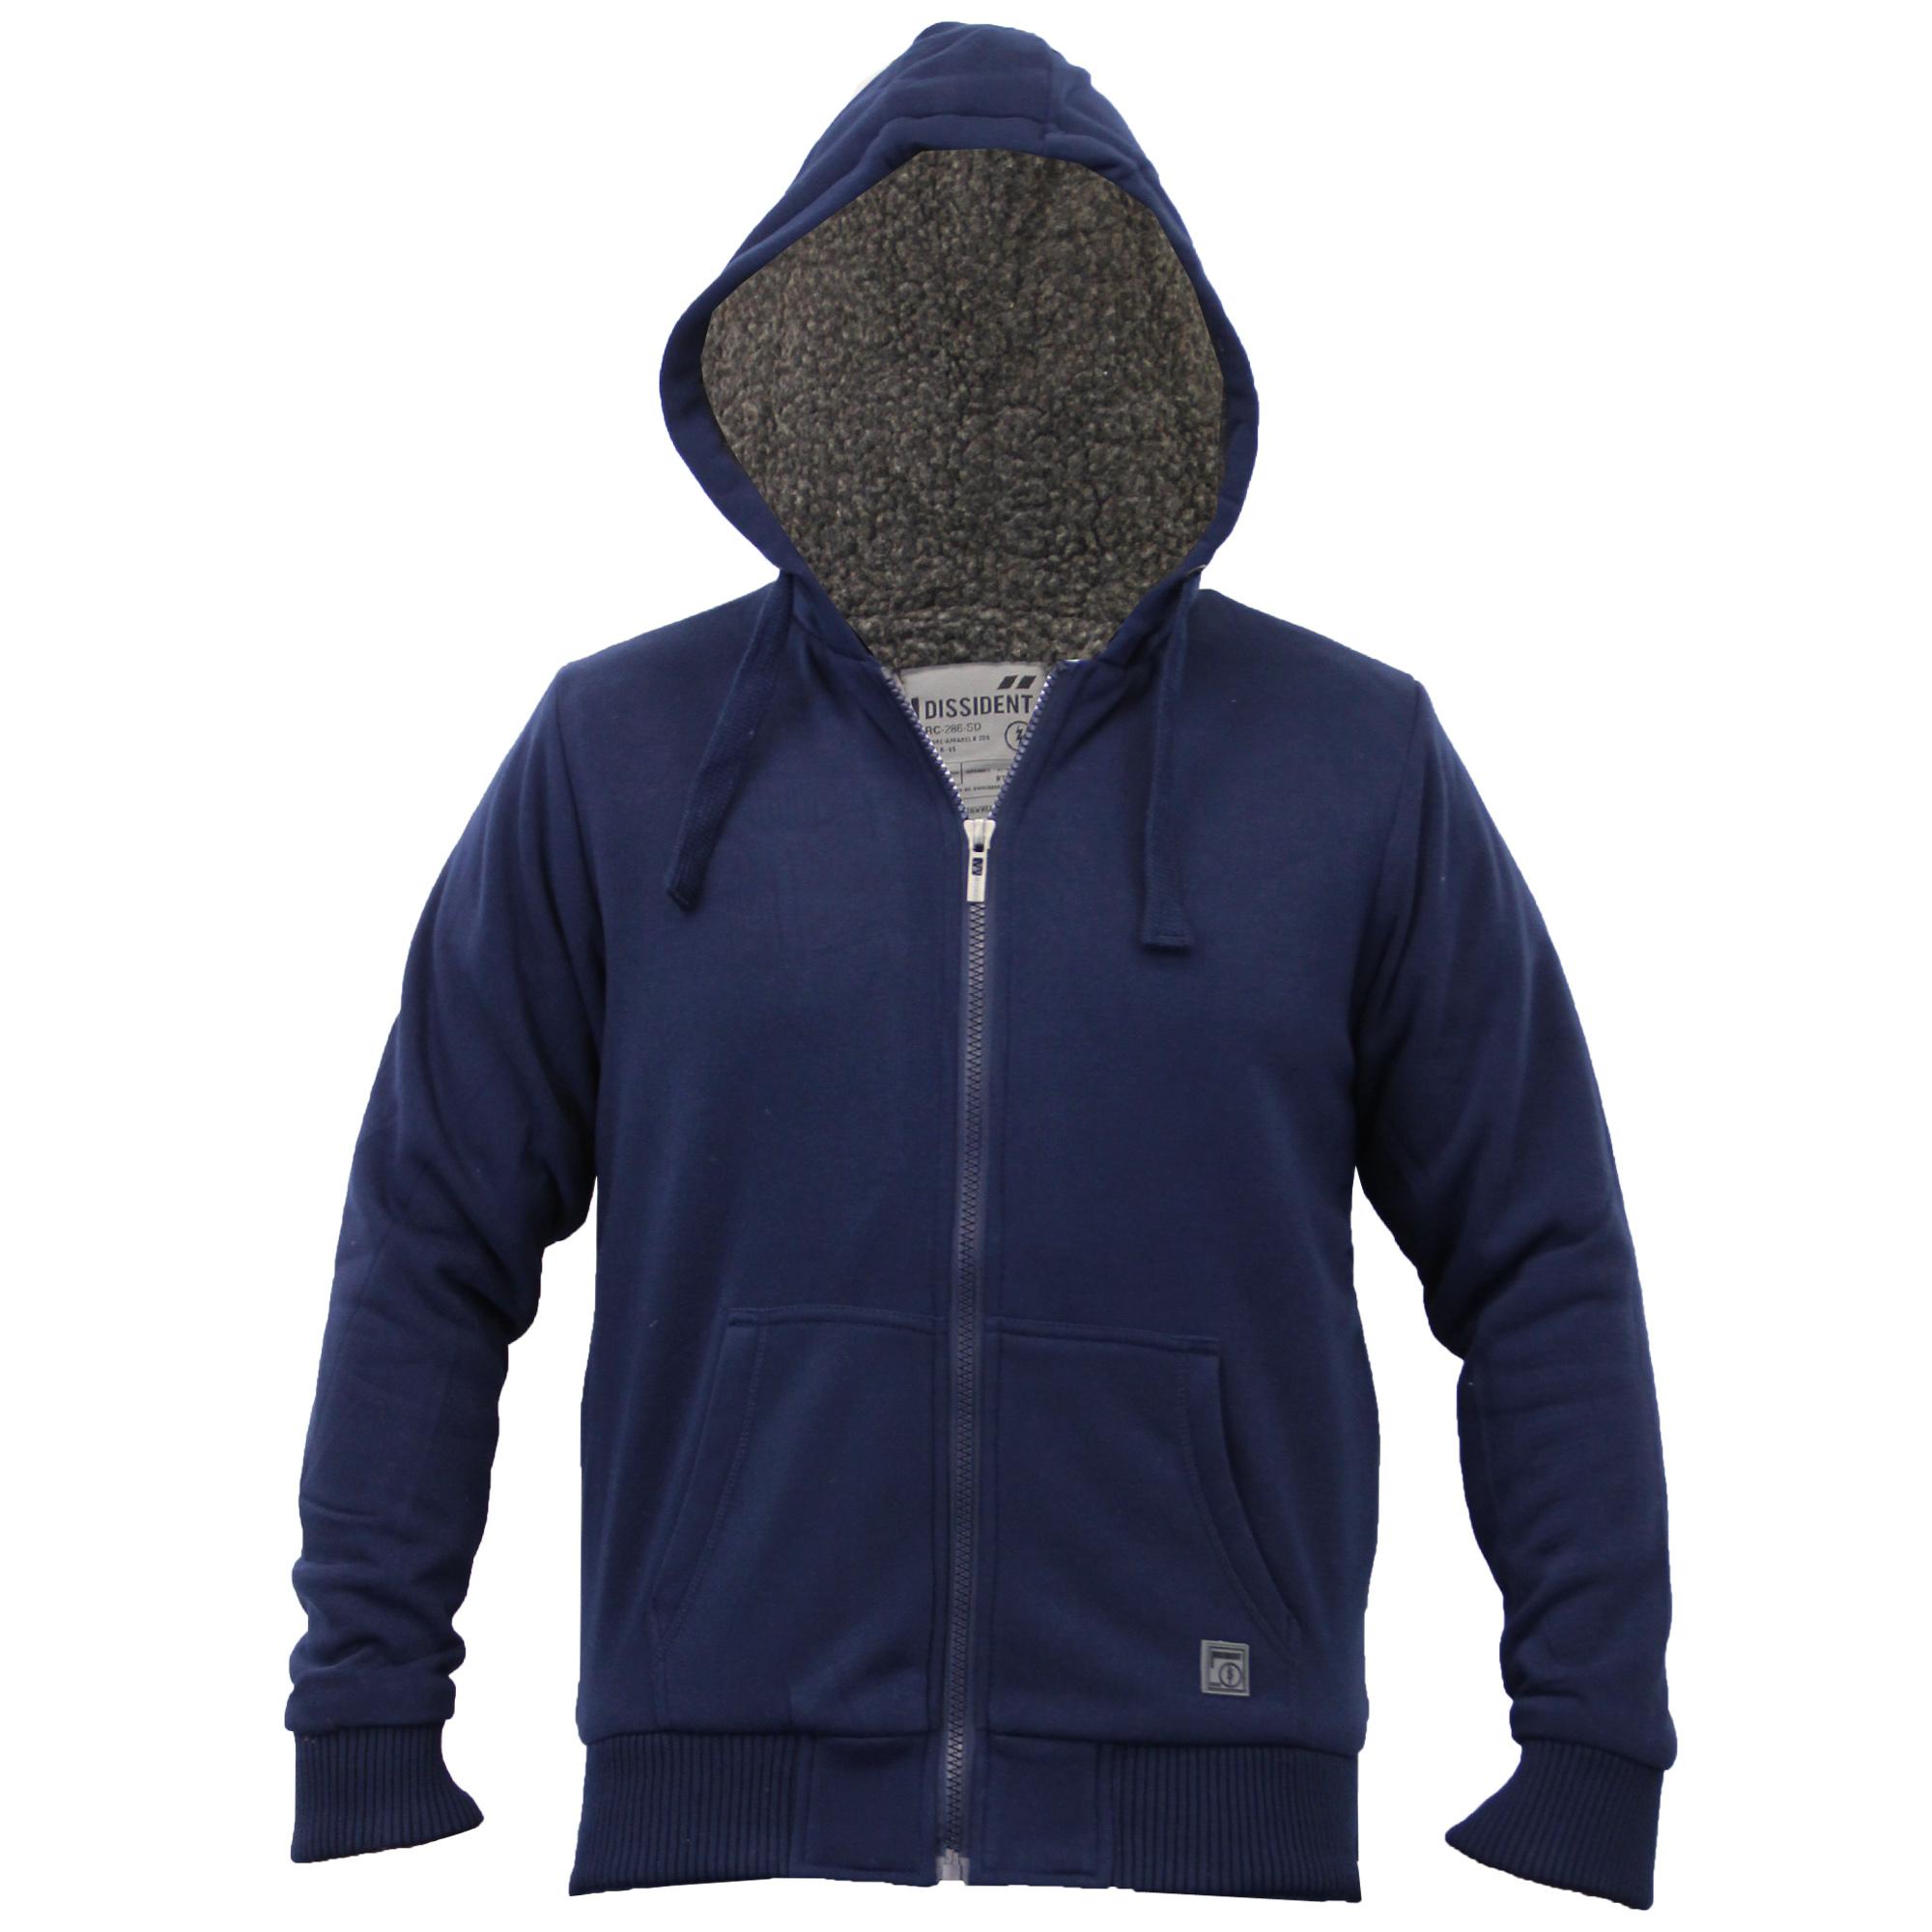 Mens Jacket Dissident Sweat Hooded Top Sherpa Fleece Lined Heavy Casual Winter